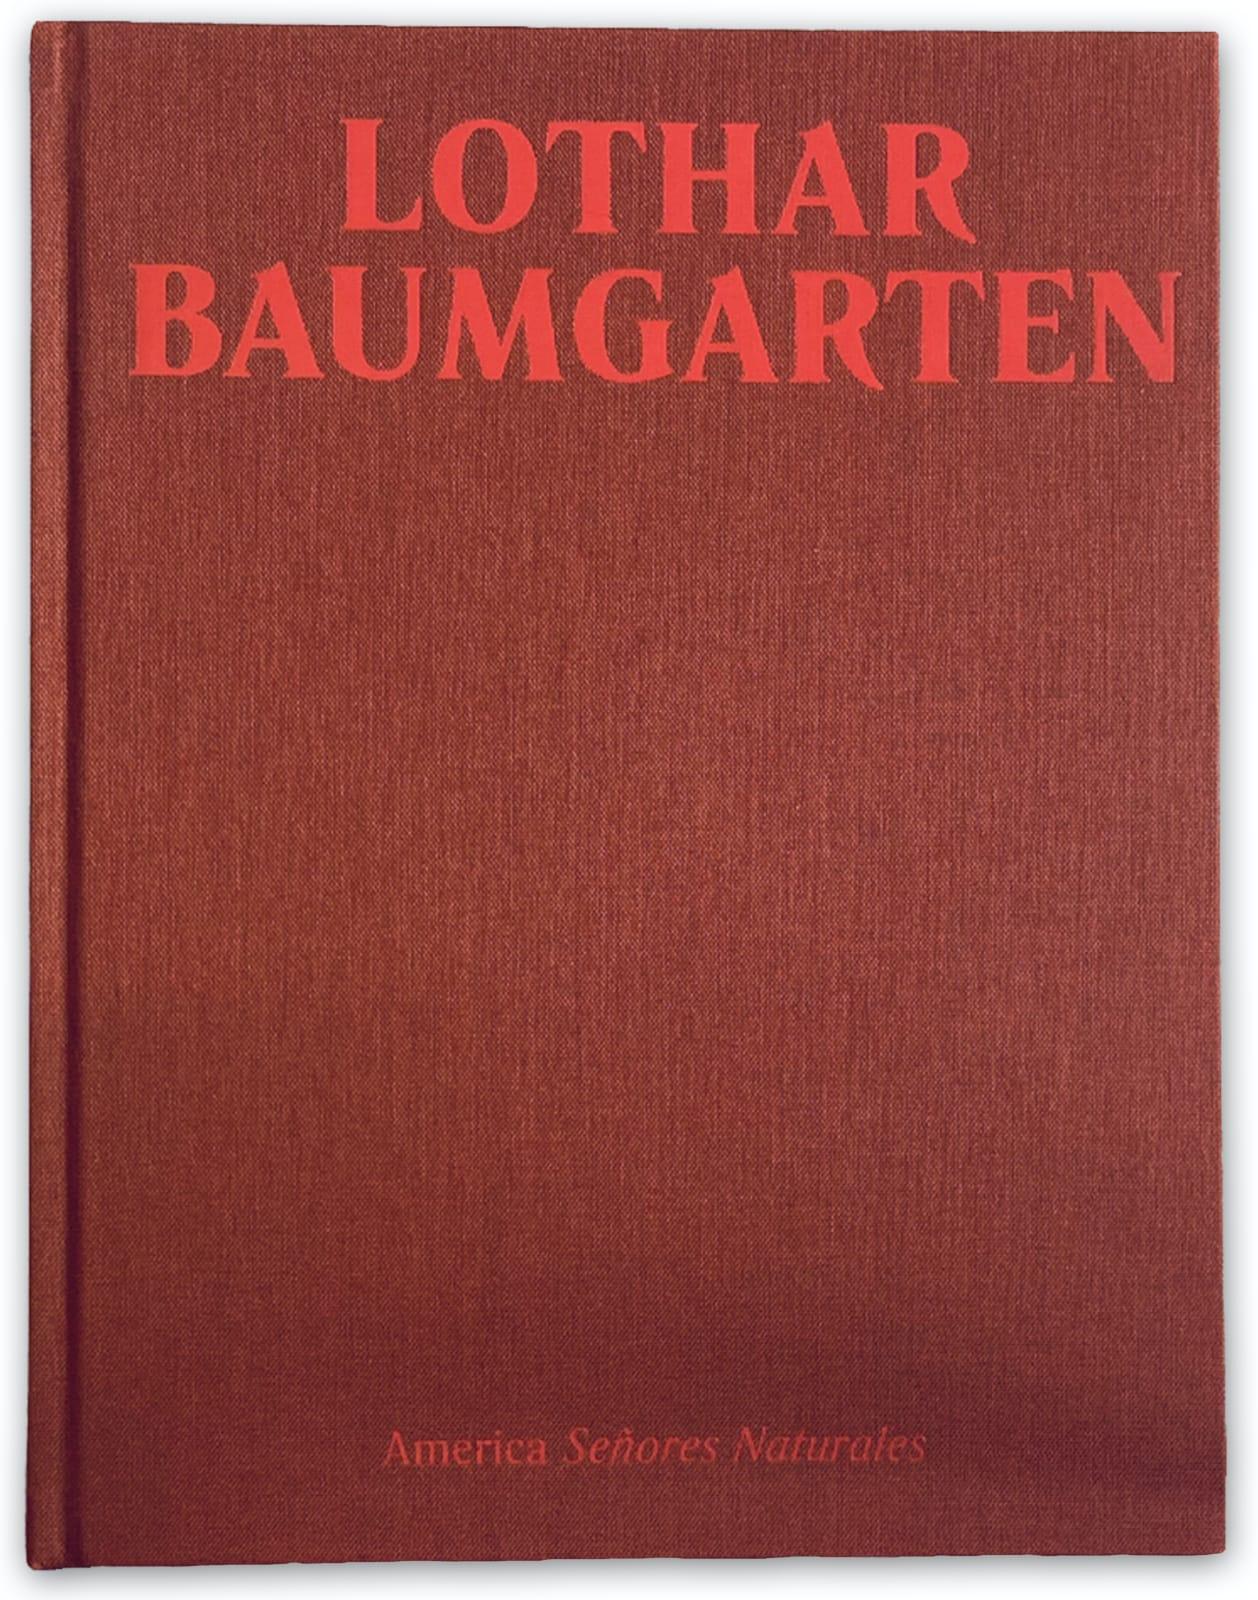 Lothar Baumgarten America Señores Naturales